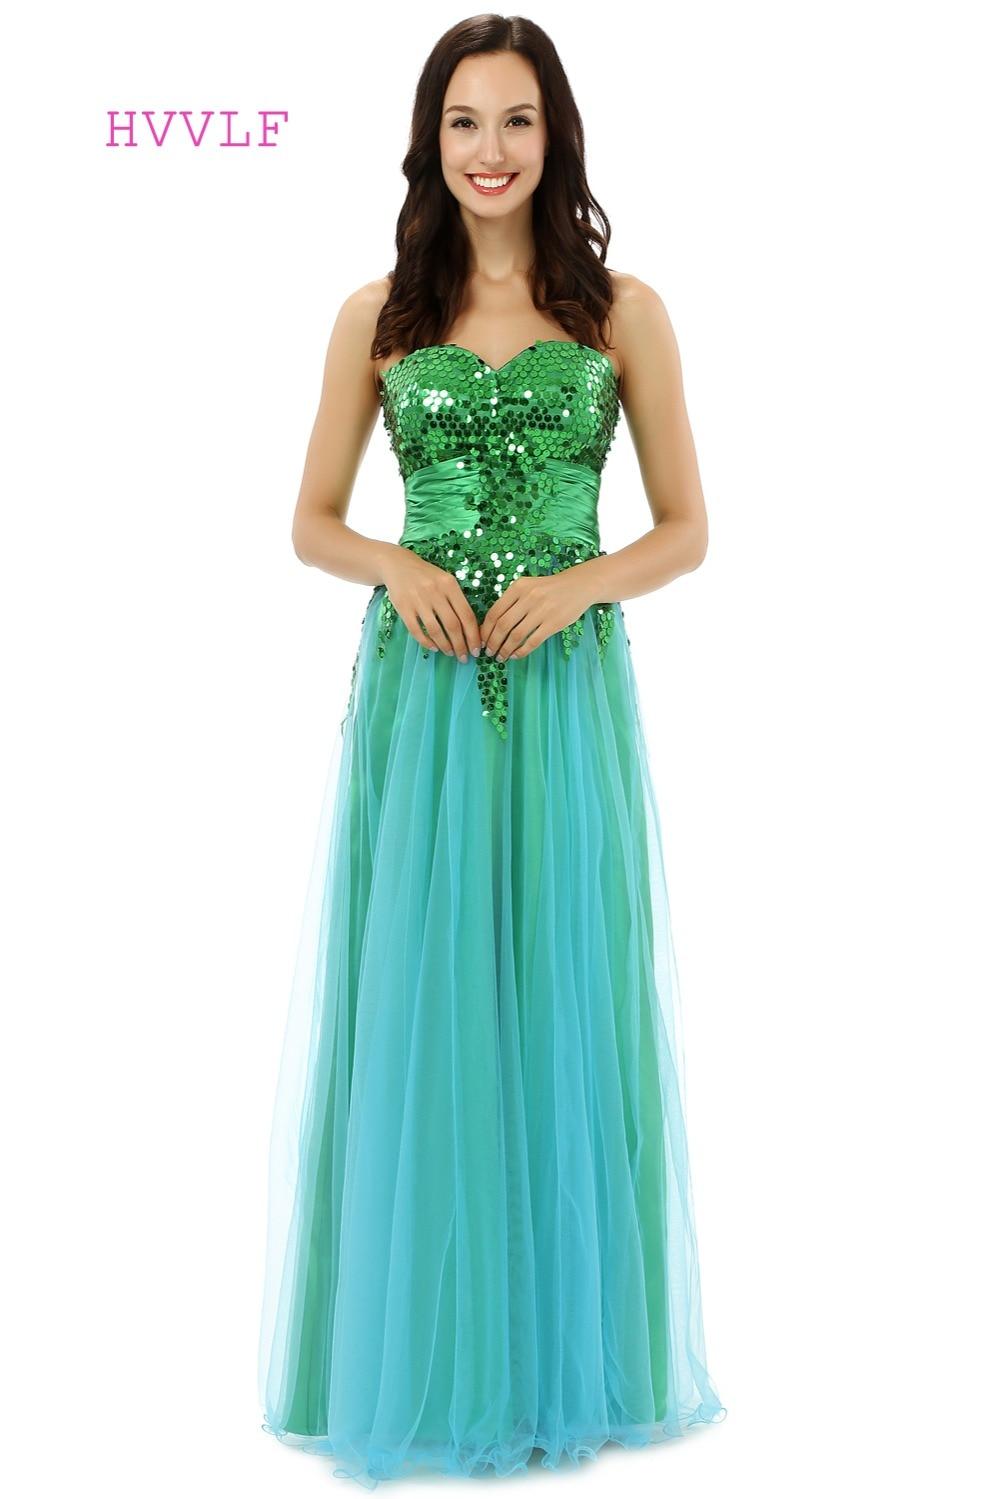 Verde Robe De Soirée 2019 A-line Querida Pavimento Length Tulle Mulheres Long Prom Vestidos de Noite do Baile de finalistas Vestido de Lantejoulas Brilham